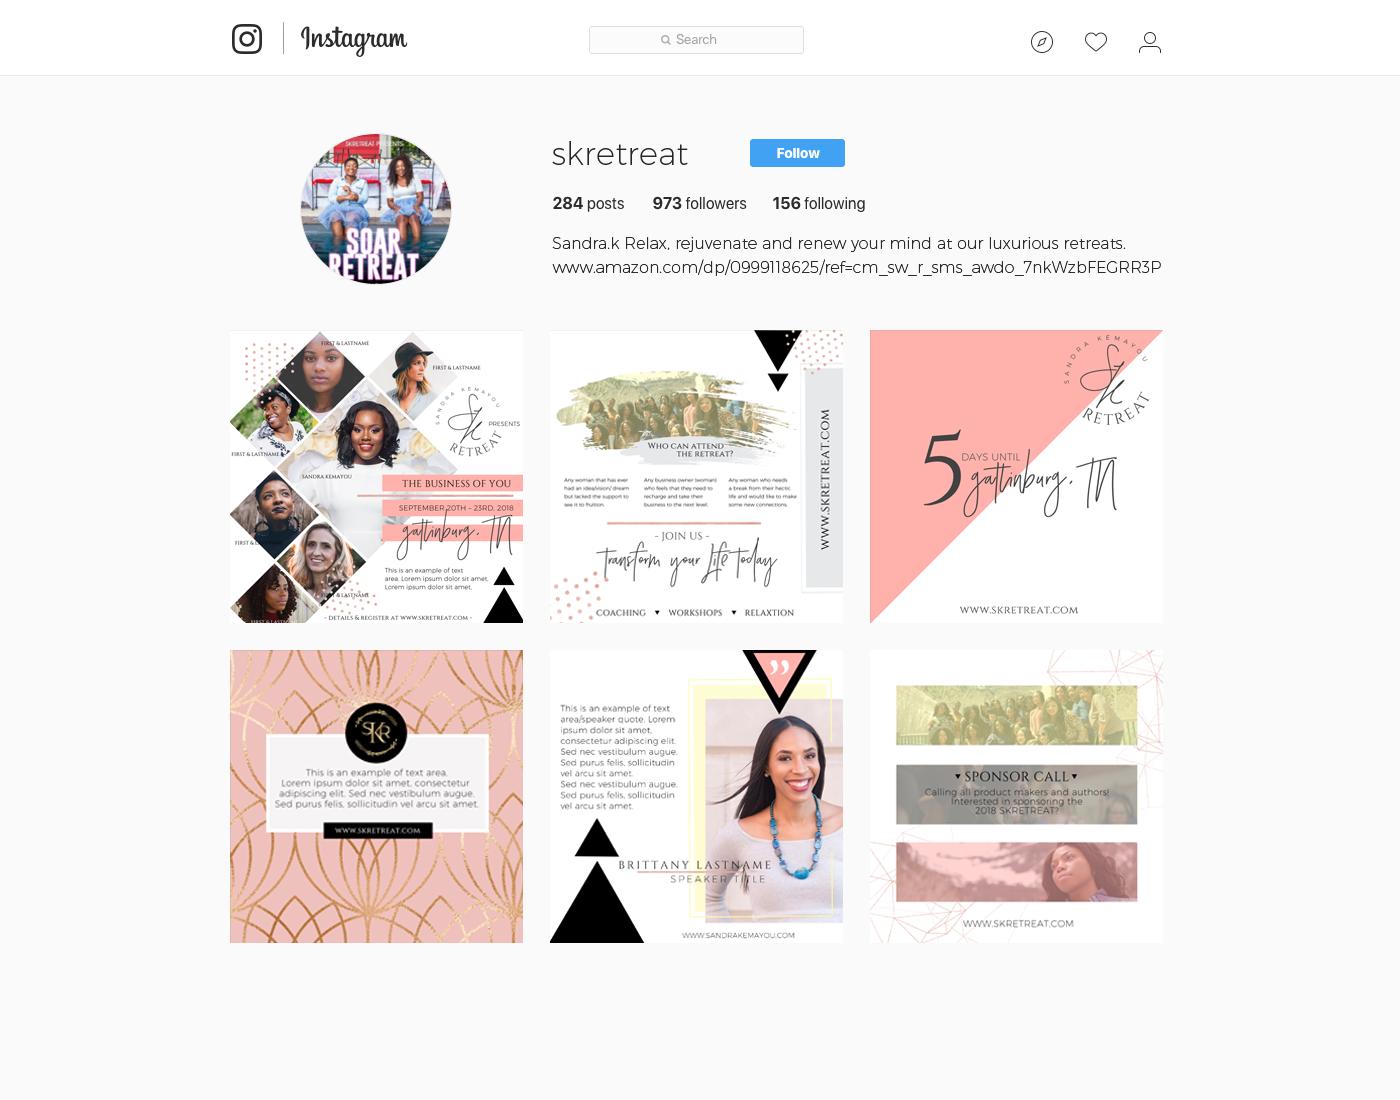 skreated_instagram-profile.png